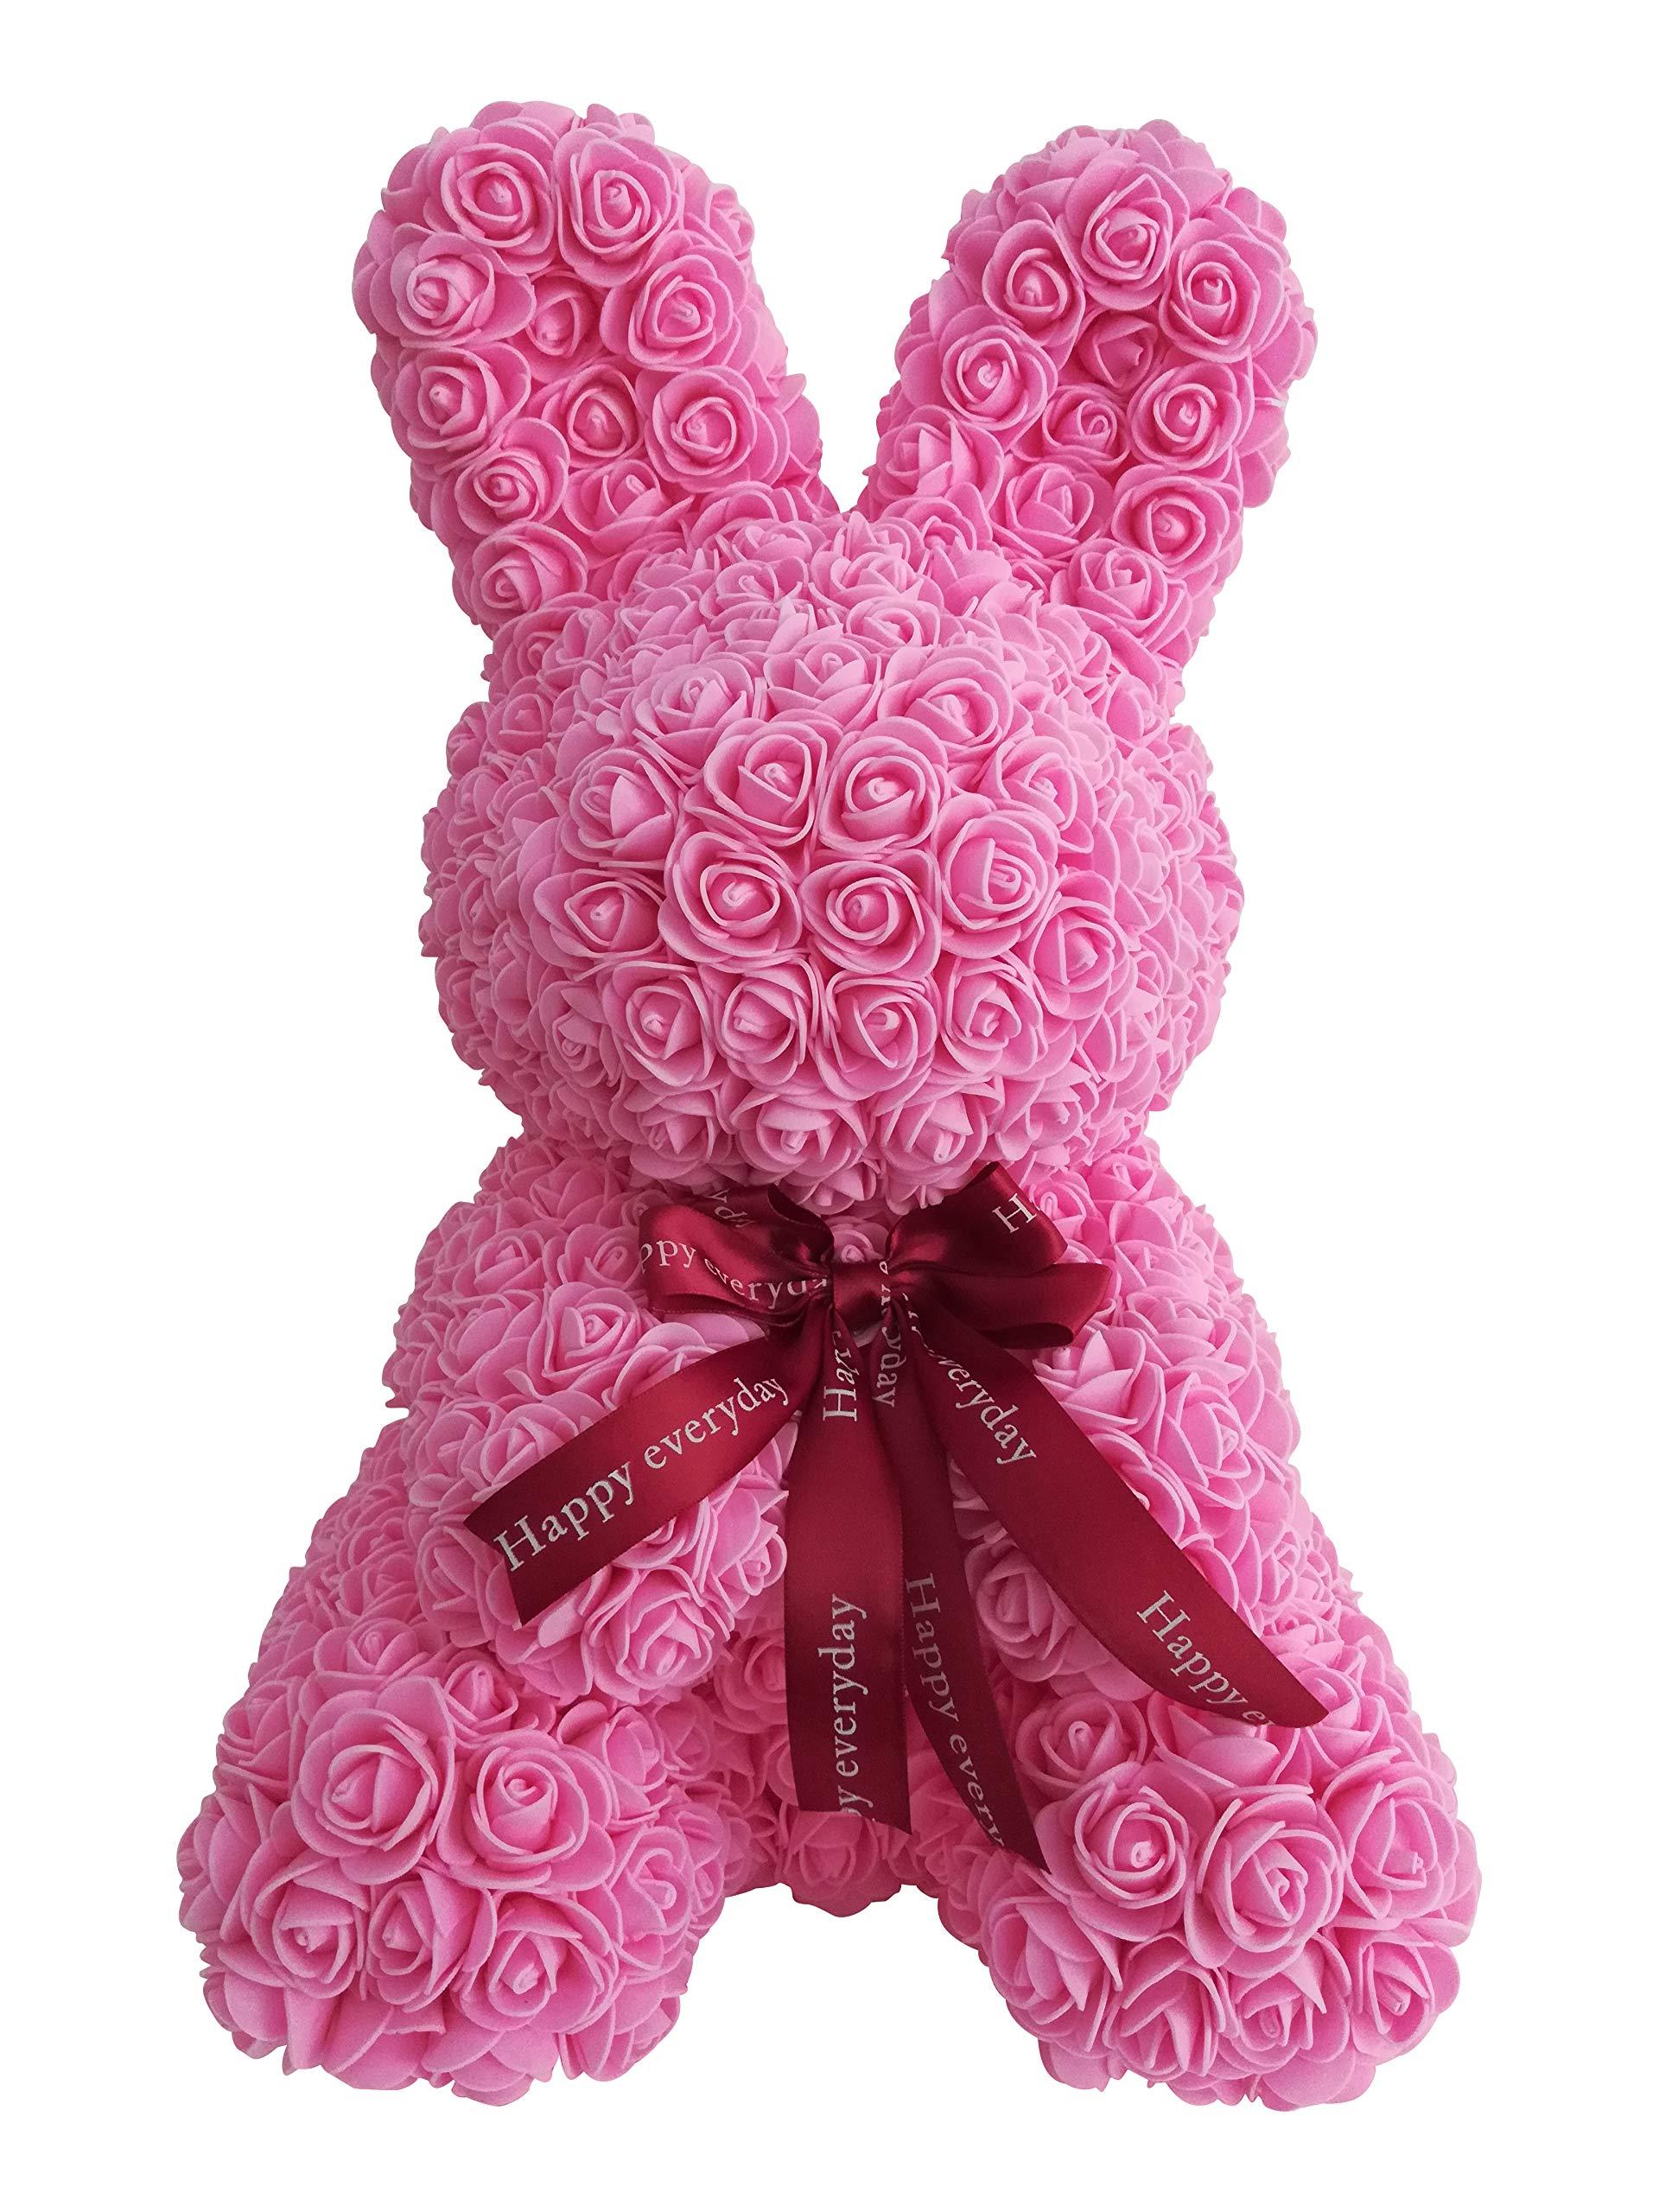 silk flower arrangements tigerlee 45cm rabbit rose artificial rose forever rose everlasting flower for window display, anniversary christmas valentines easter gift by longshow (pink)